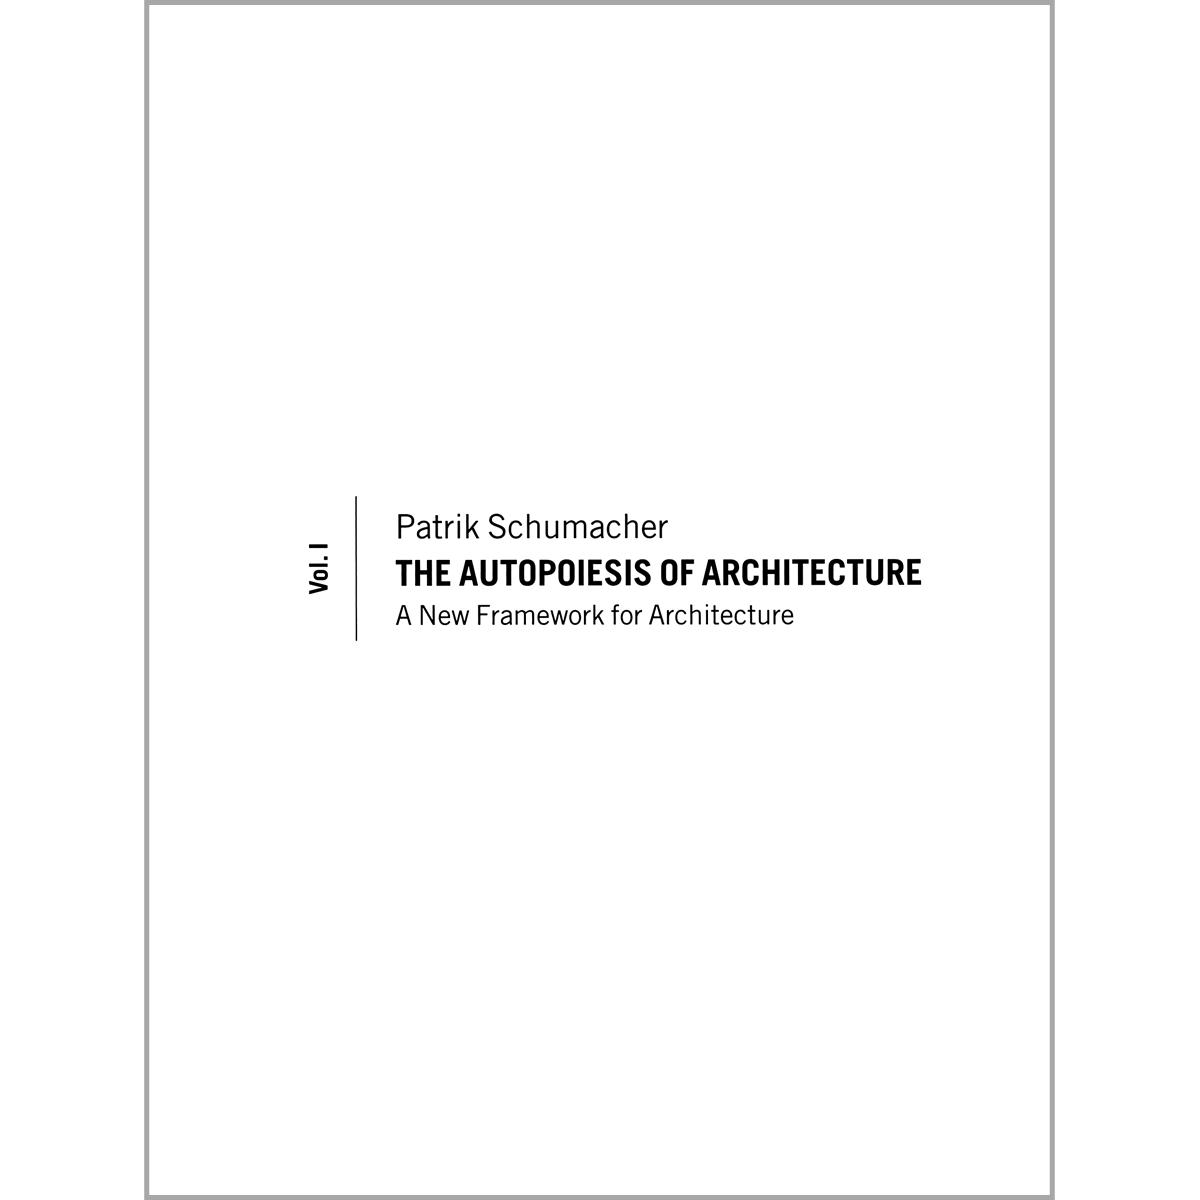 The Autopoiesis of Architecture